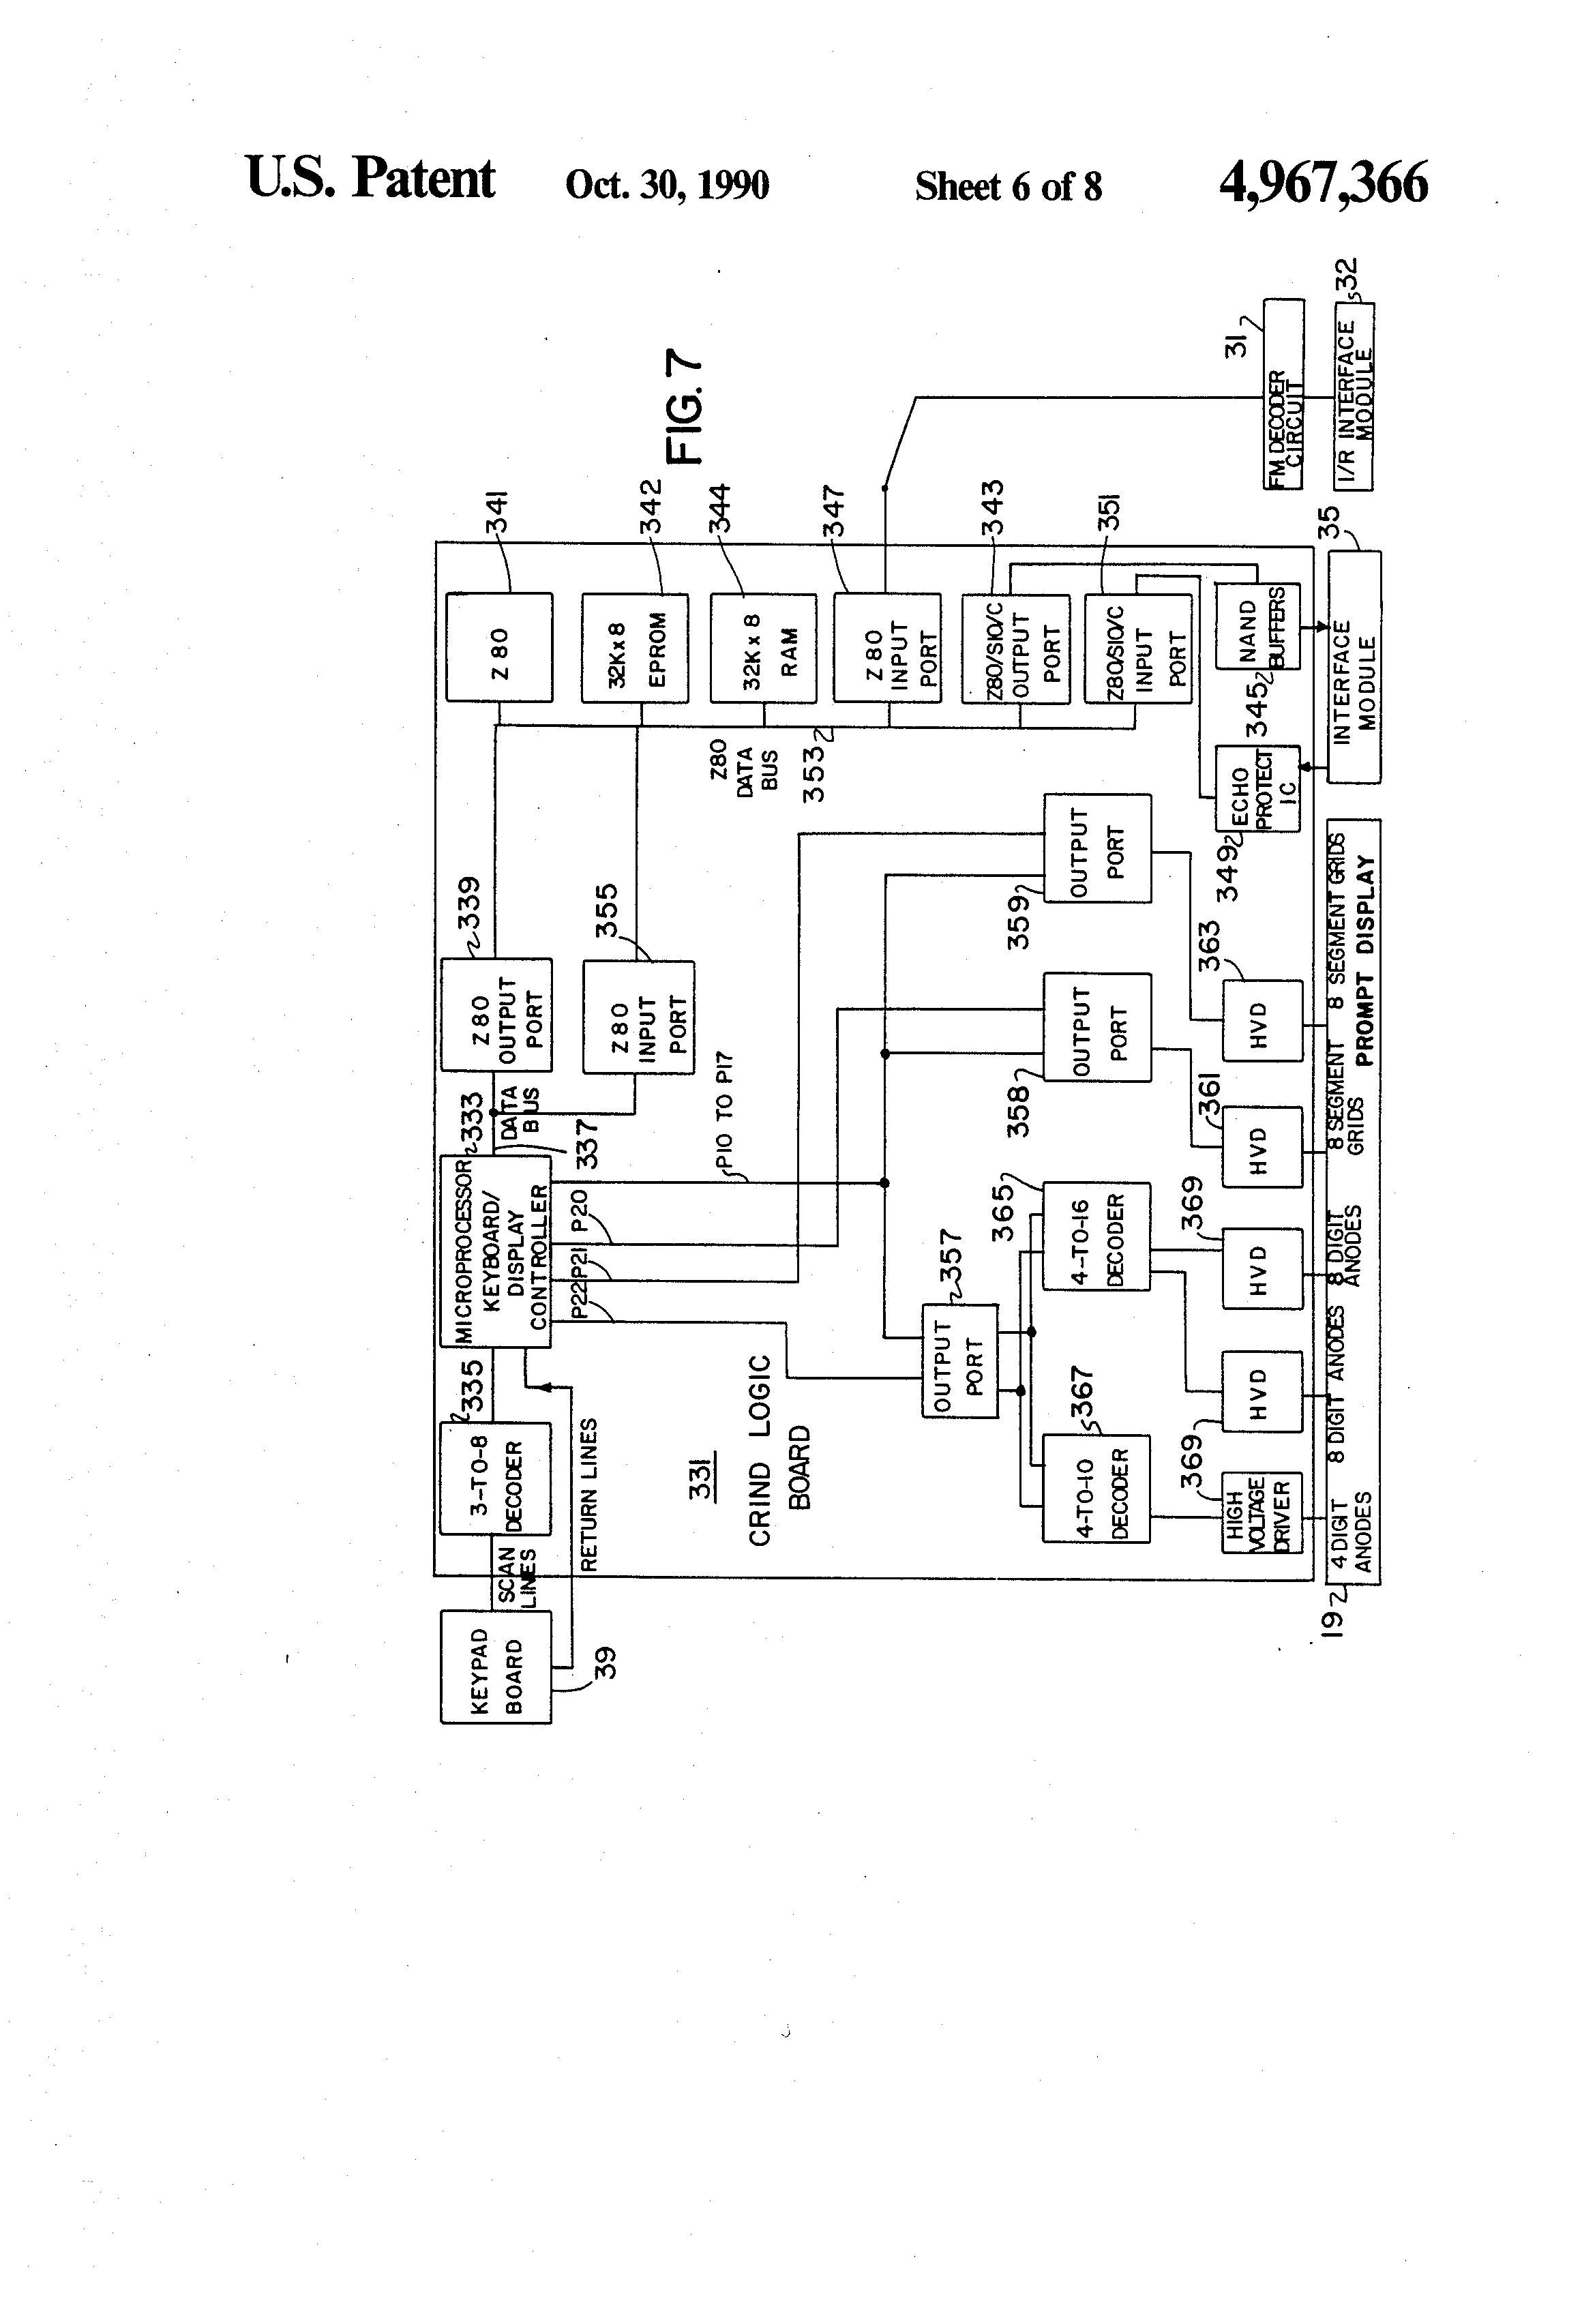 Gilbarco Pumps Diagram Schematic Diagrams Gas Pump Wiring Wire Data Schema U2022 Air